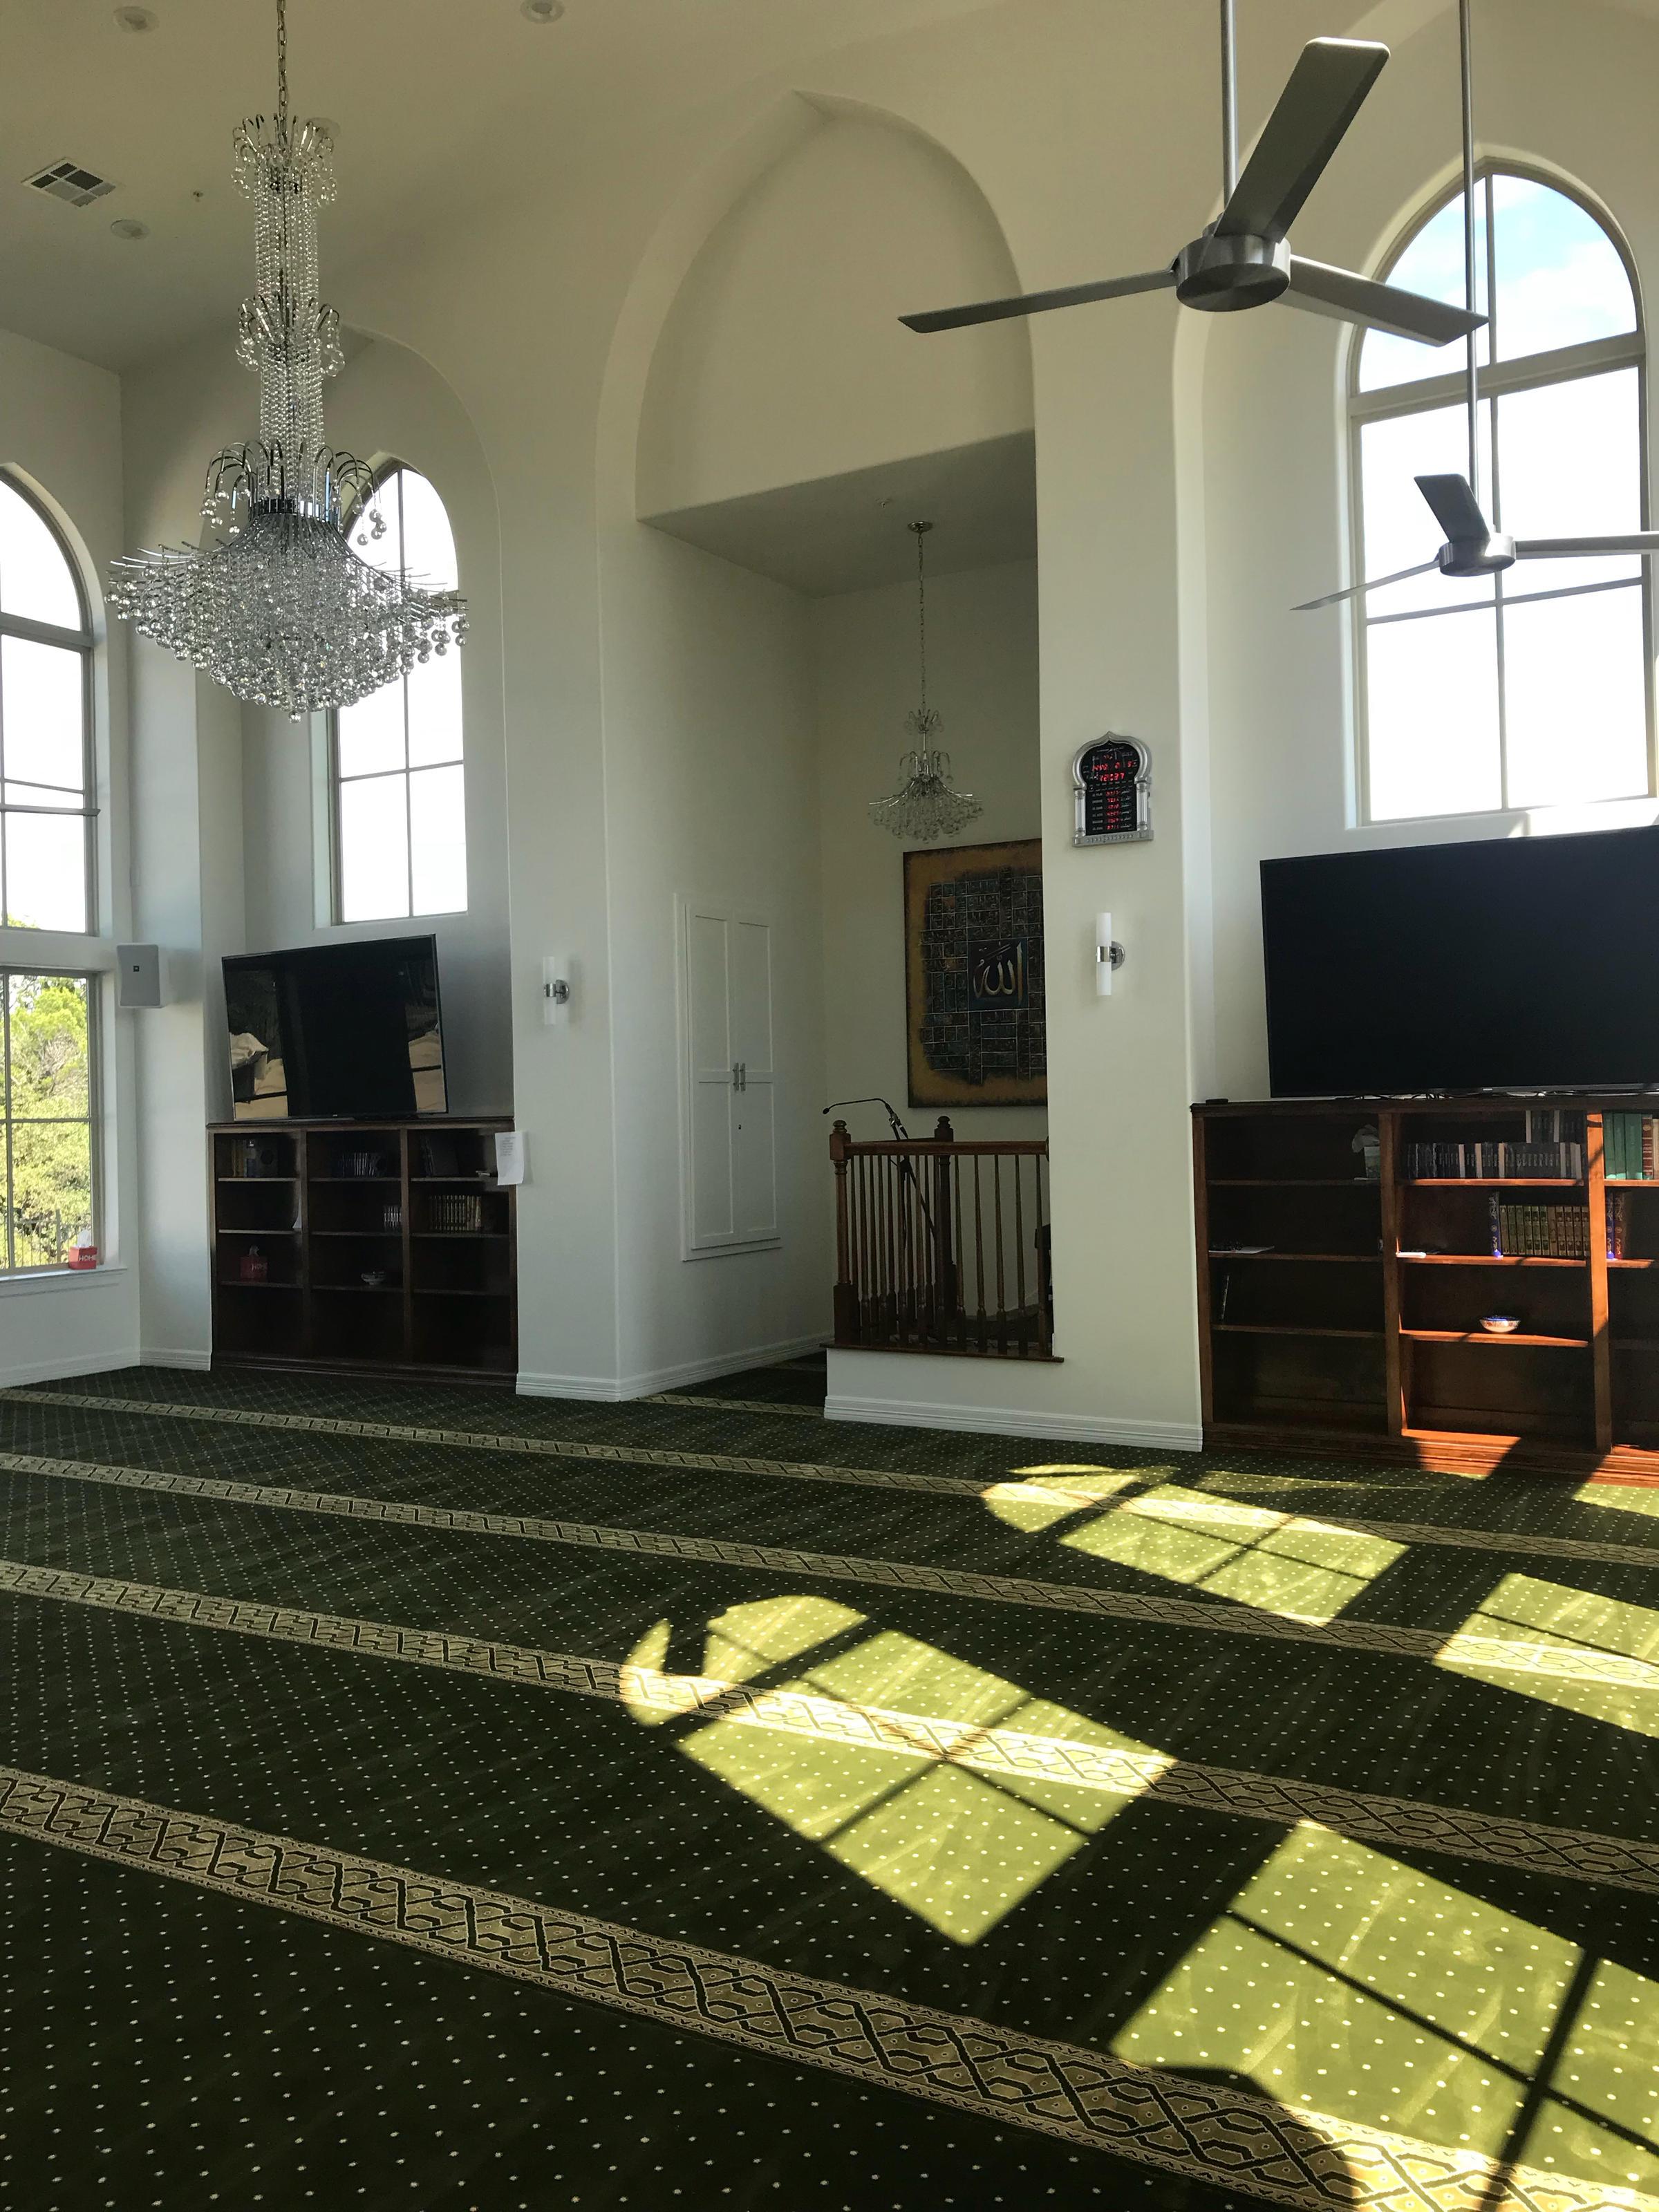 After Rash Of Vandalism, Austin's Muslim Community Tries To Balance